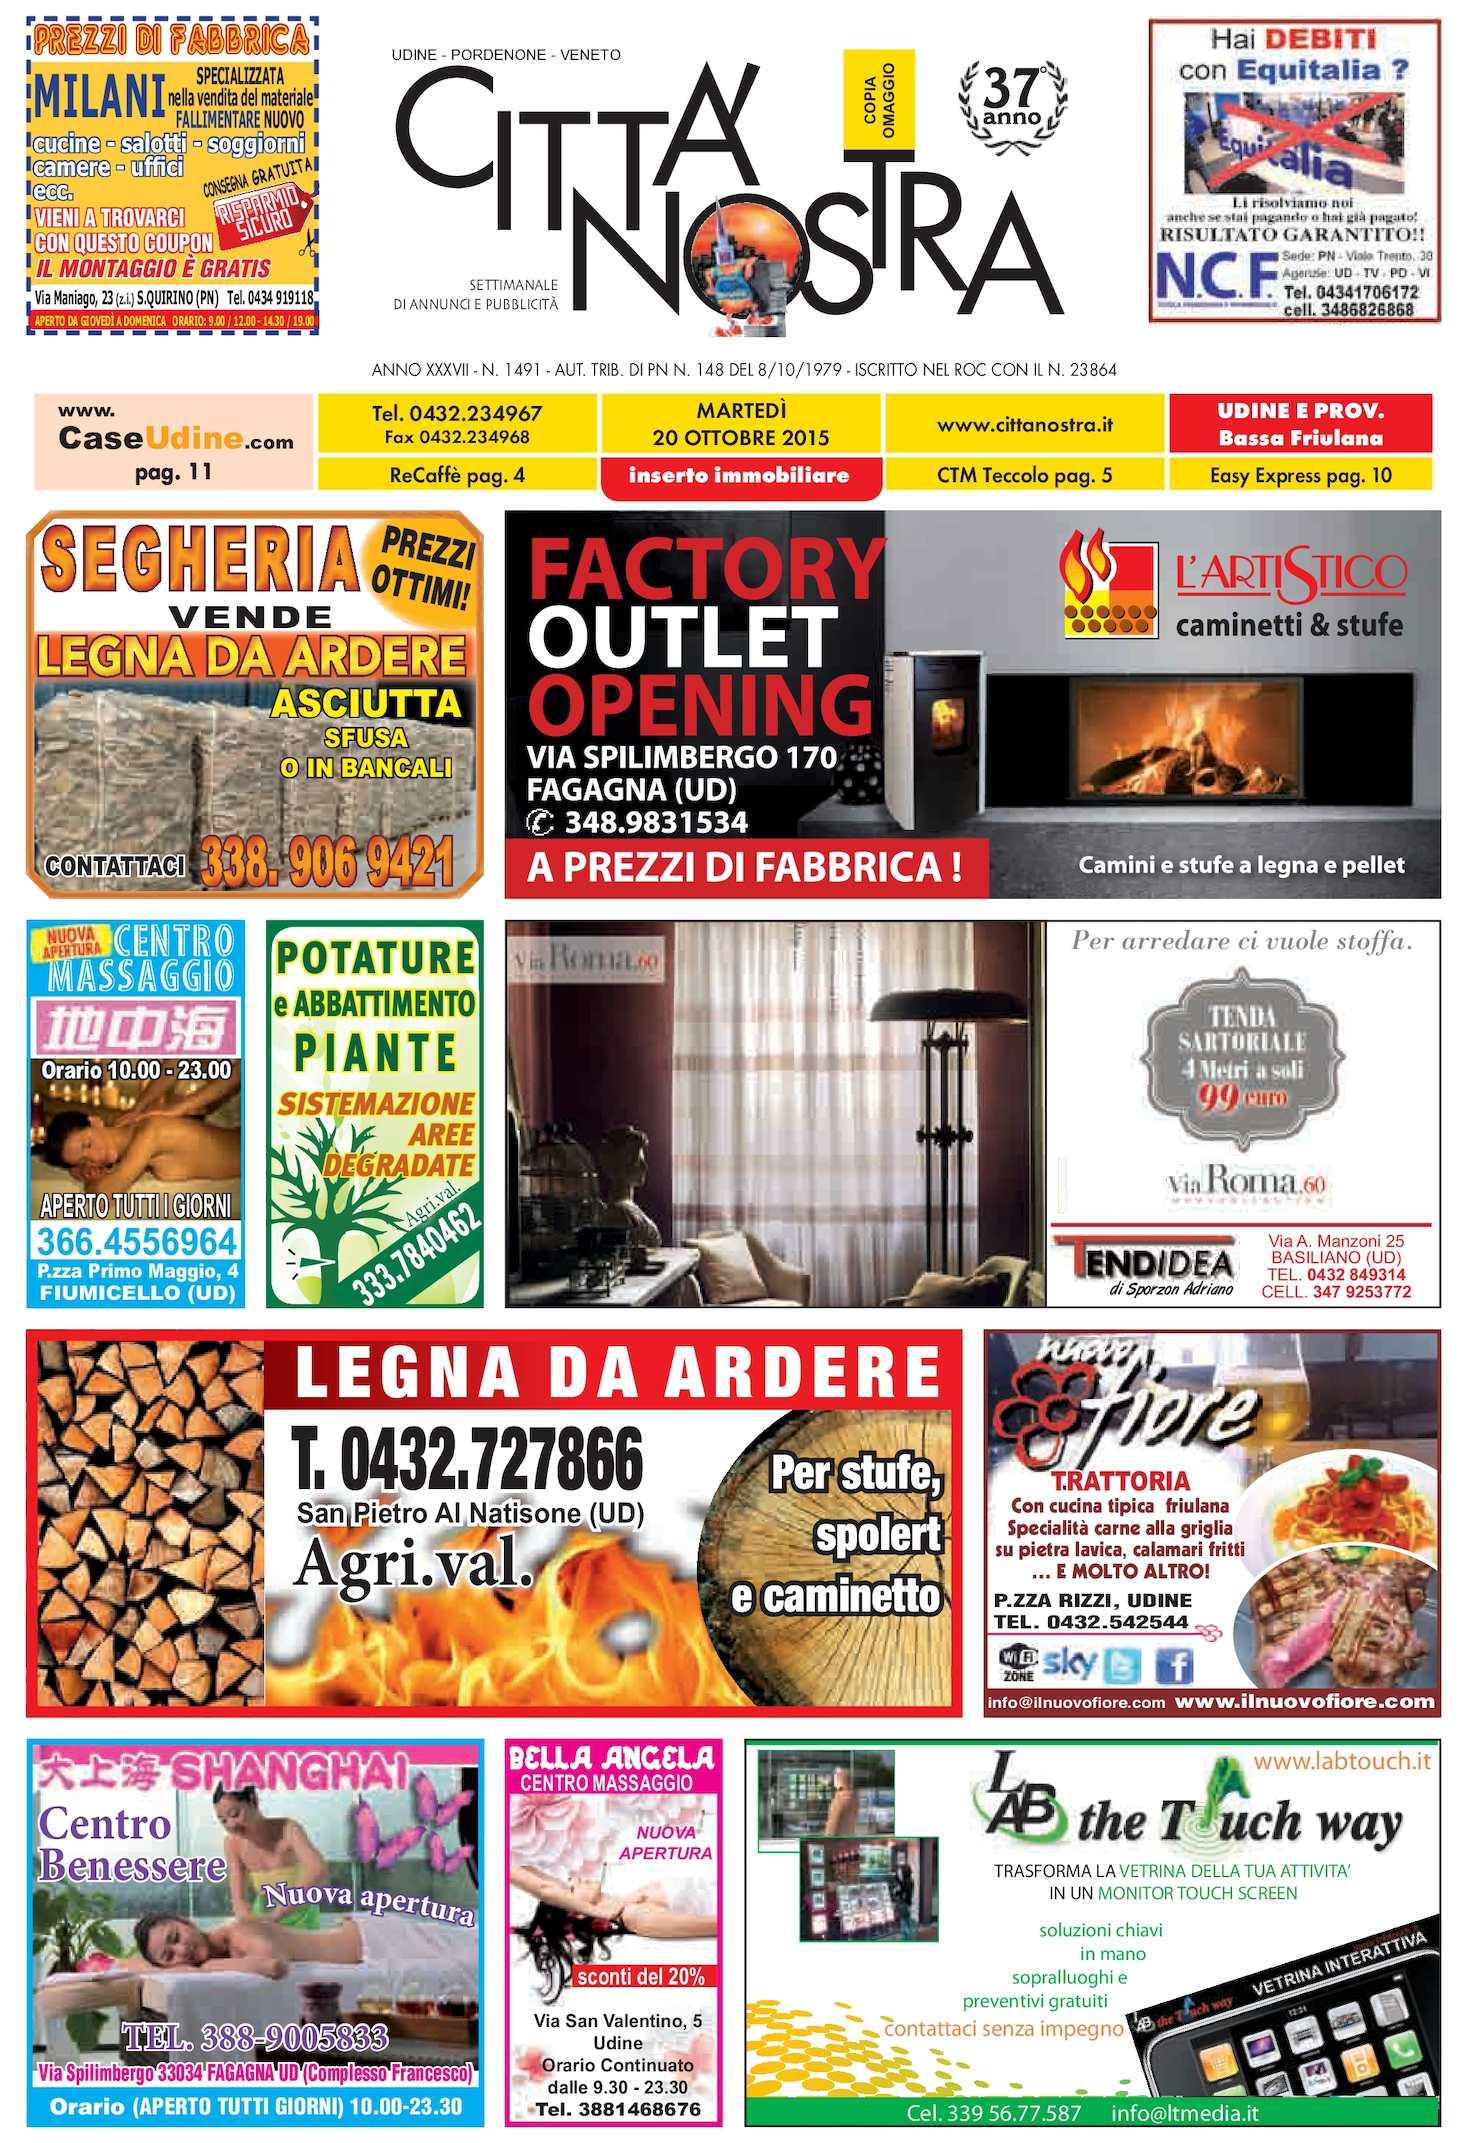 Calaméo - Città Nostra Udine del 20.10.2015 n. 1491 dde37ed6e74